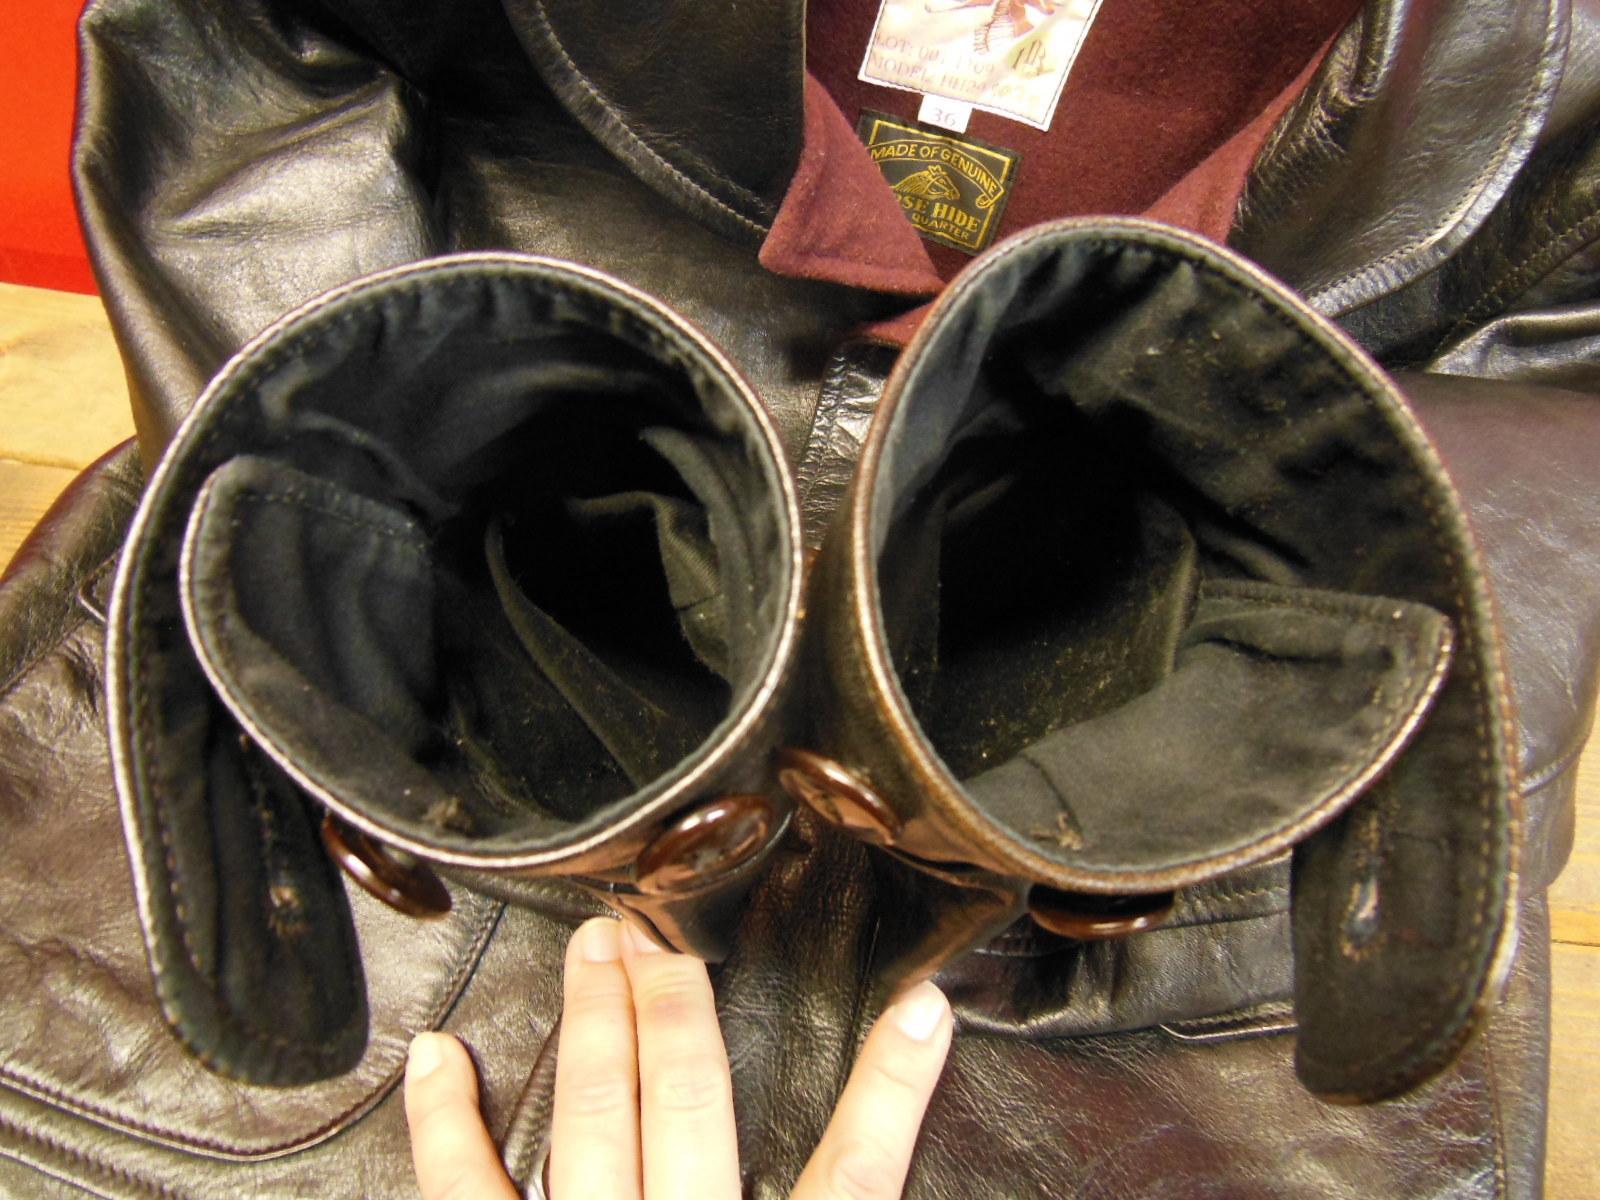 USED HIMEL BROTHERS LEATHER HERON 1929/新喜皮革製黒ホースハイド/SIZE-36/ボタンフロント A-1 ジャケット_c0187684_15052186.jpg